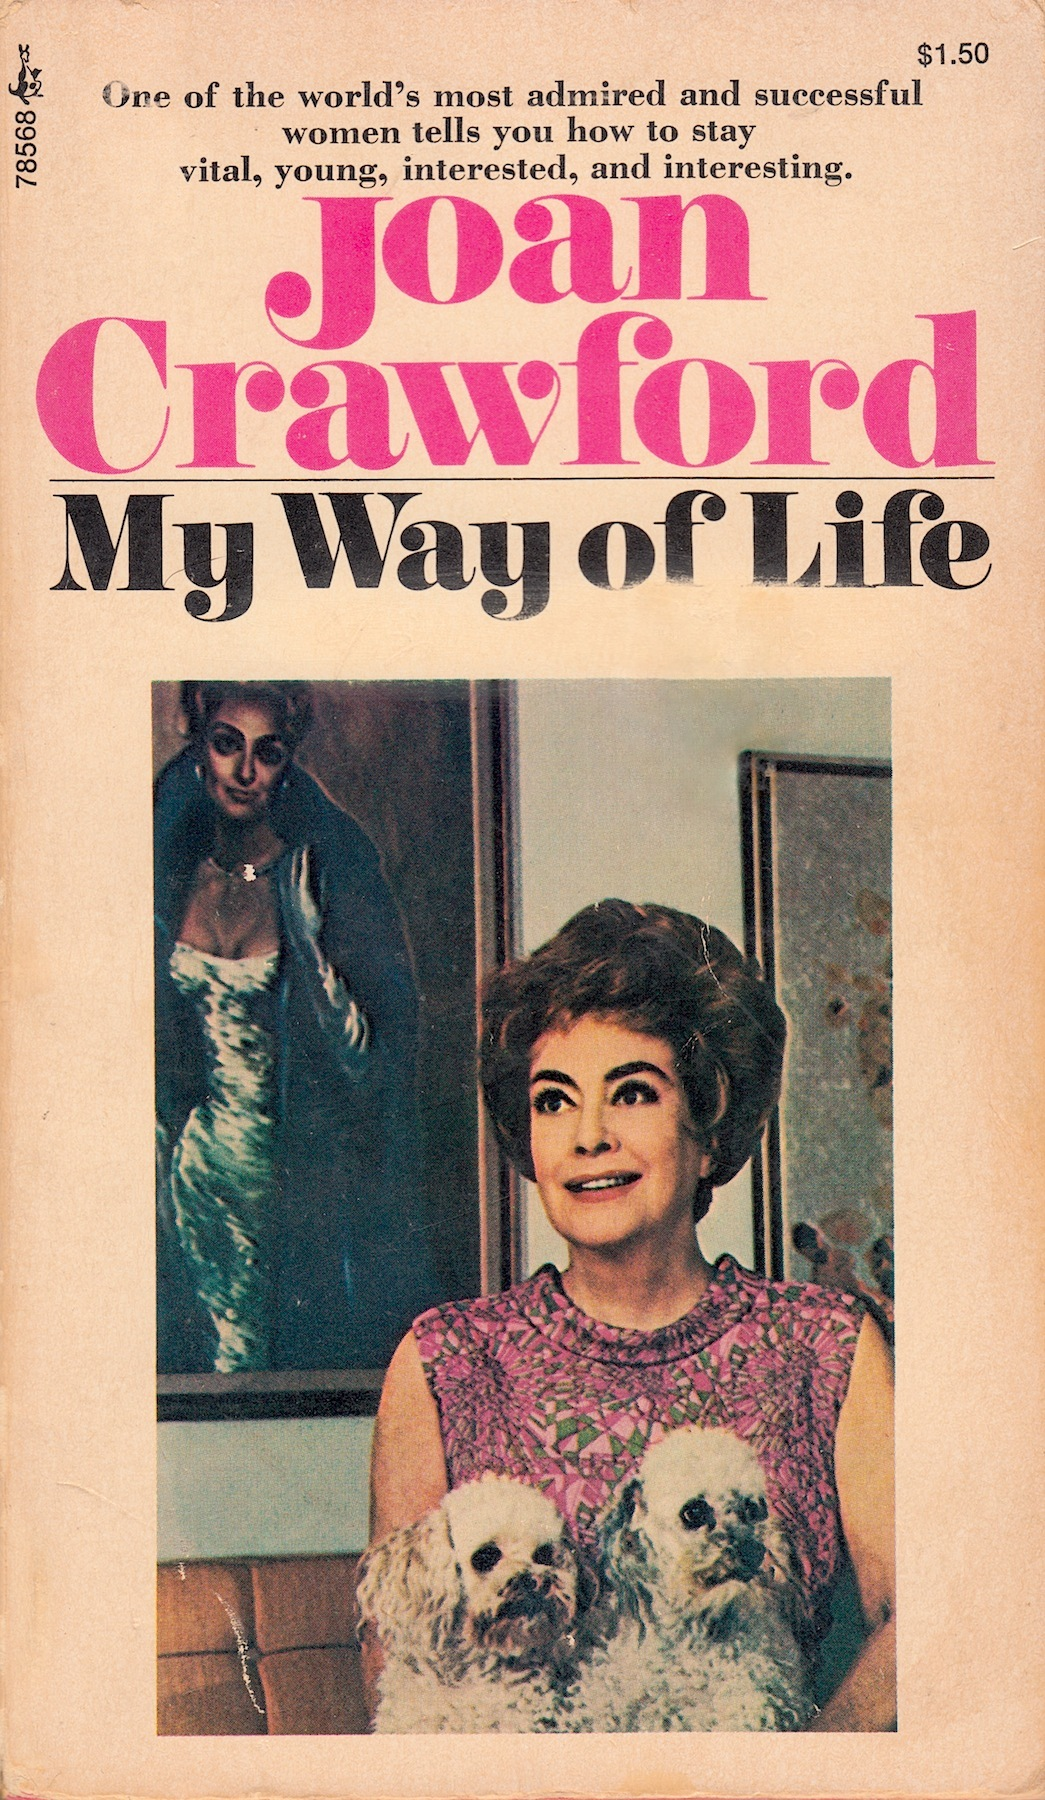 joan-crawford-my-way-of-life-1971.jpg